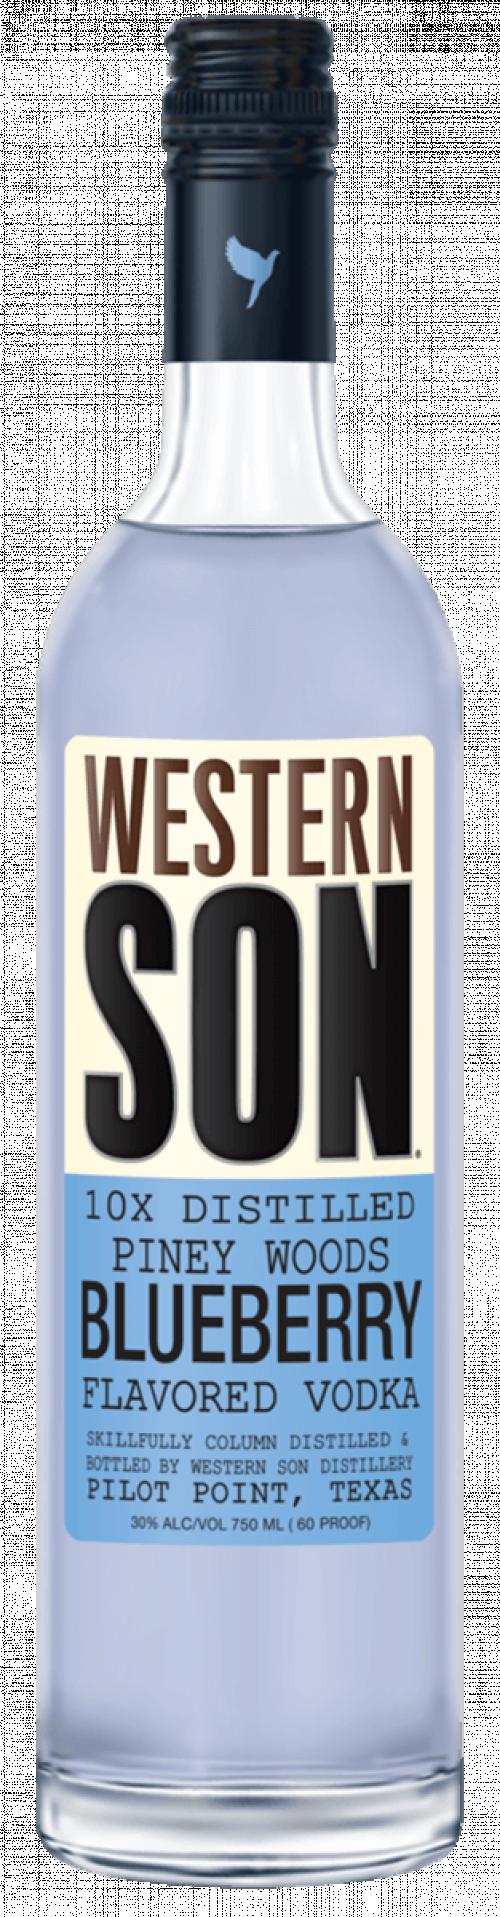 Western Son Blueberry Vodka 1L